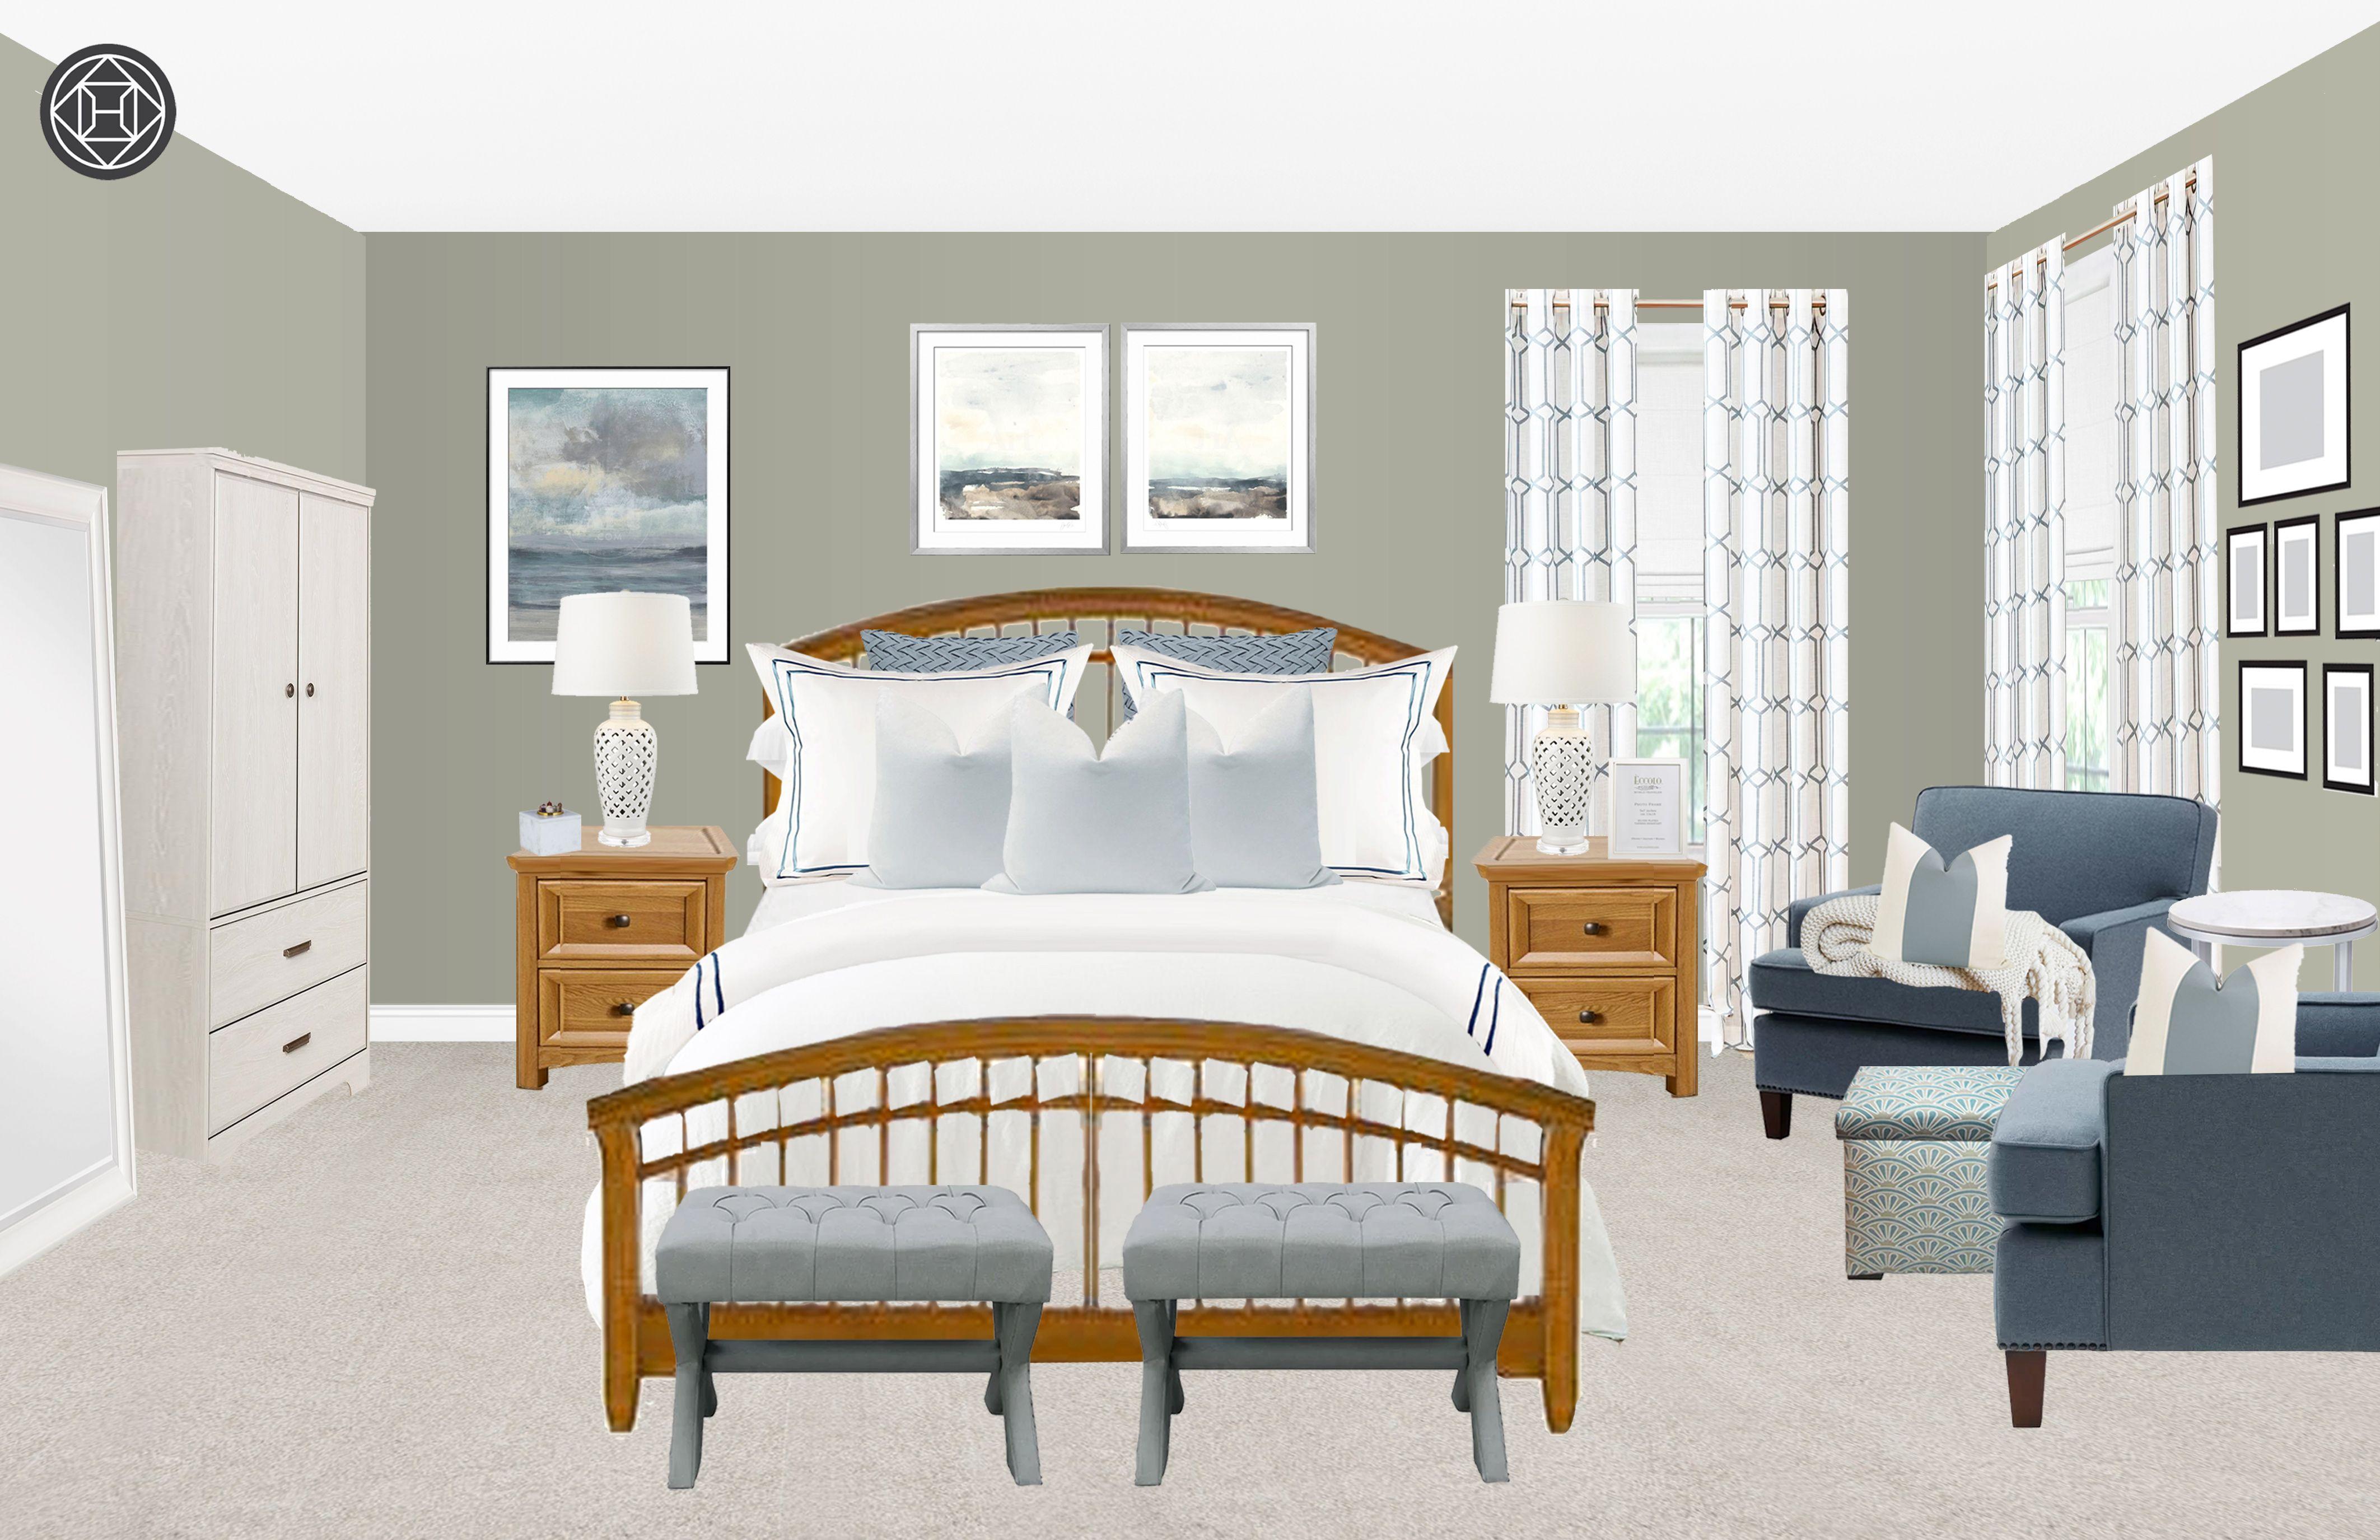 Classic, Coastal, Preppy Bedroom Design by Havenly